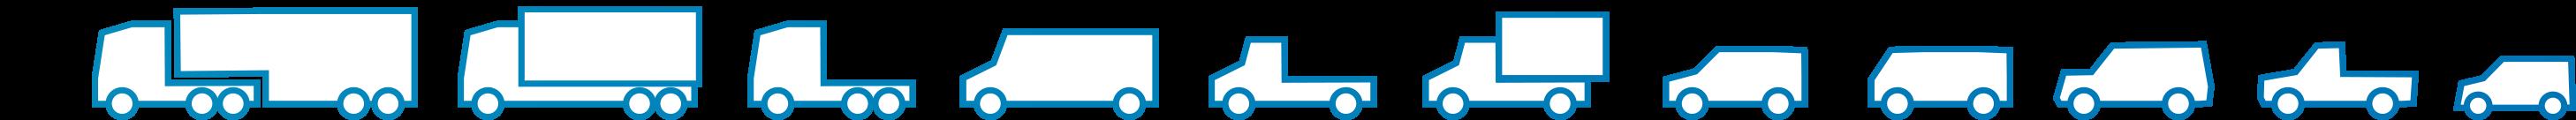 Groei bedrijfswagen verkoop Europa